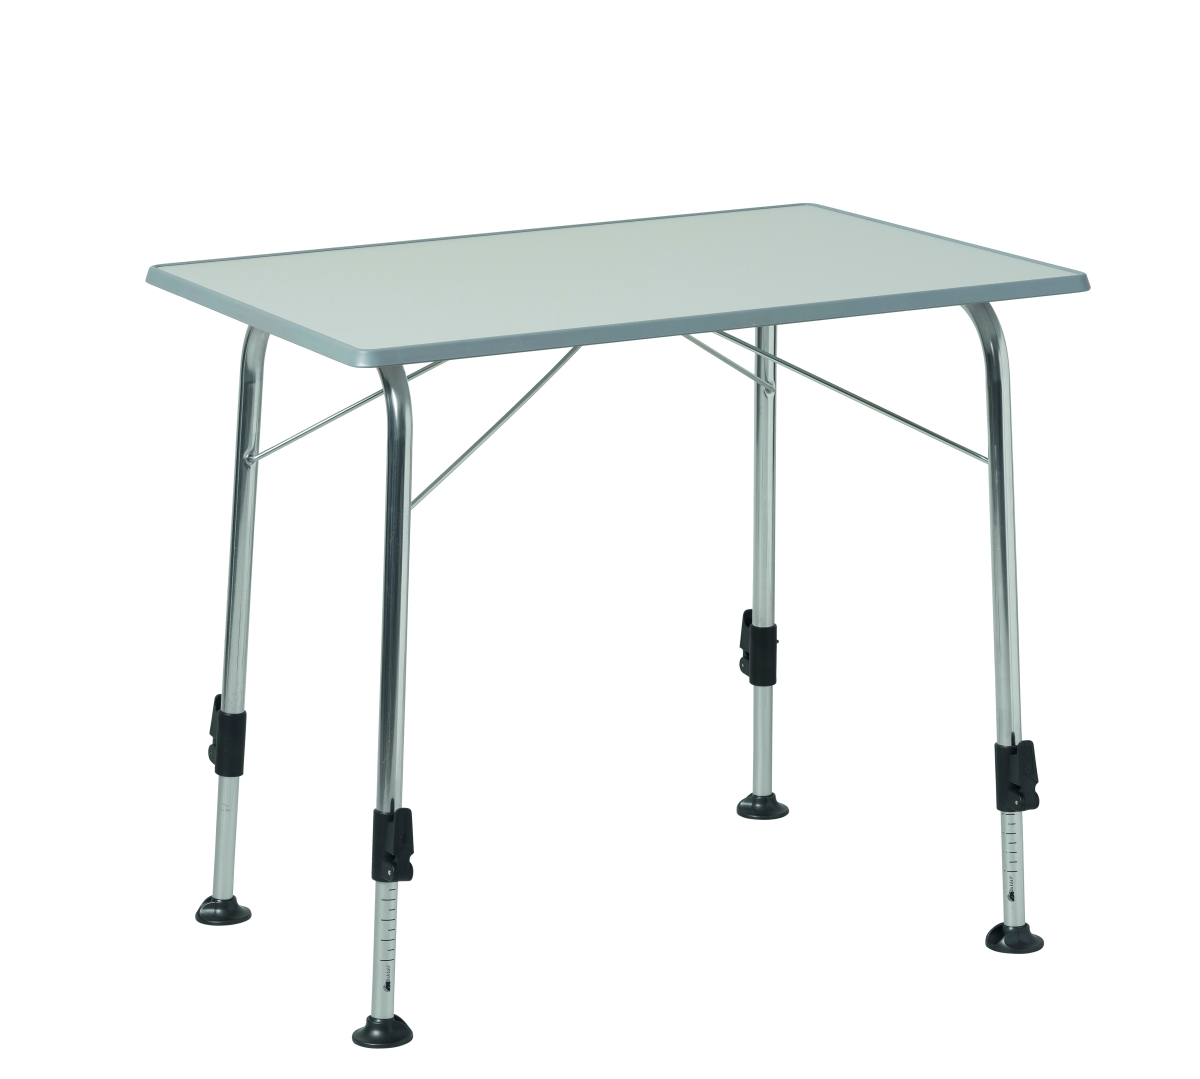 Dukdalf Tisch STABILIC I Luxe, hellgrau